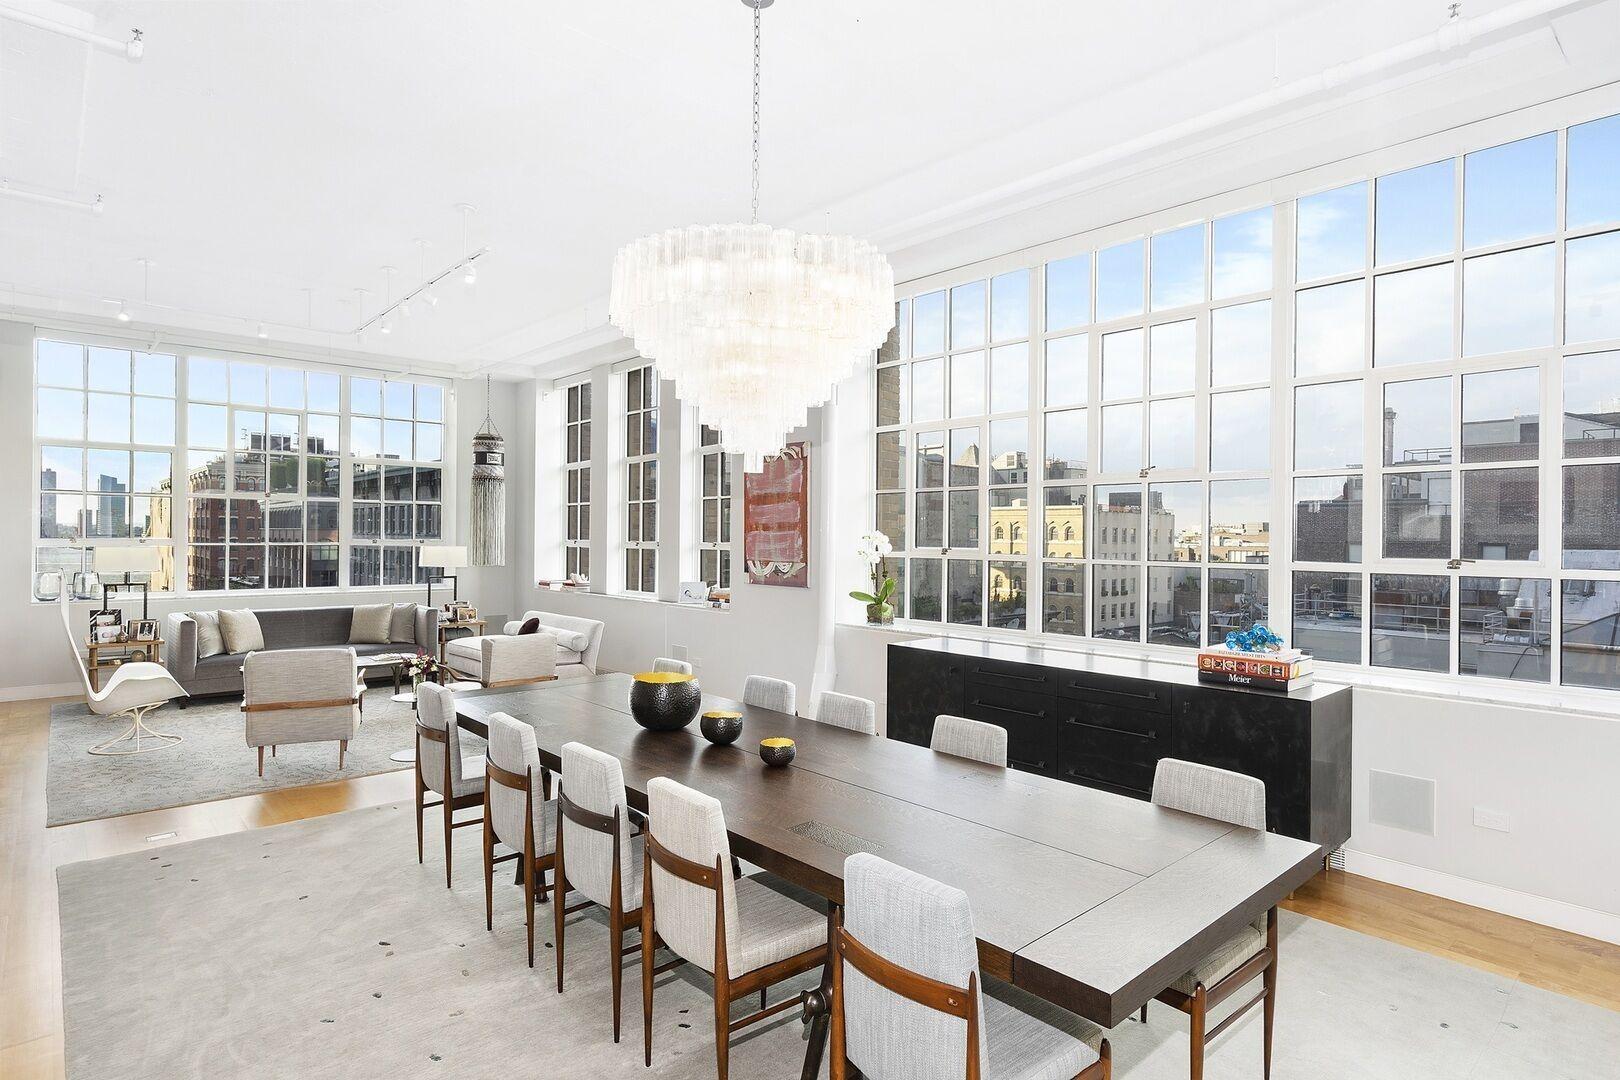 Apartment for sale at 145 Hudson Street, Apt 8B